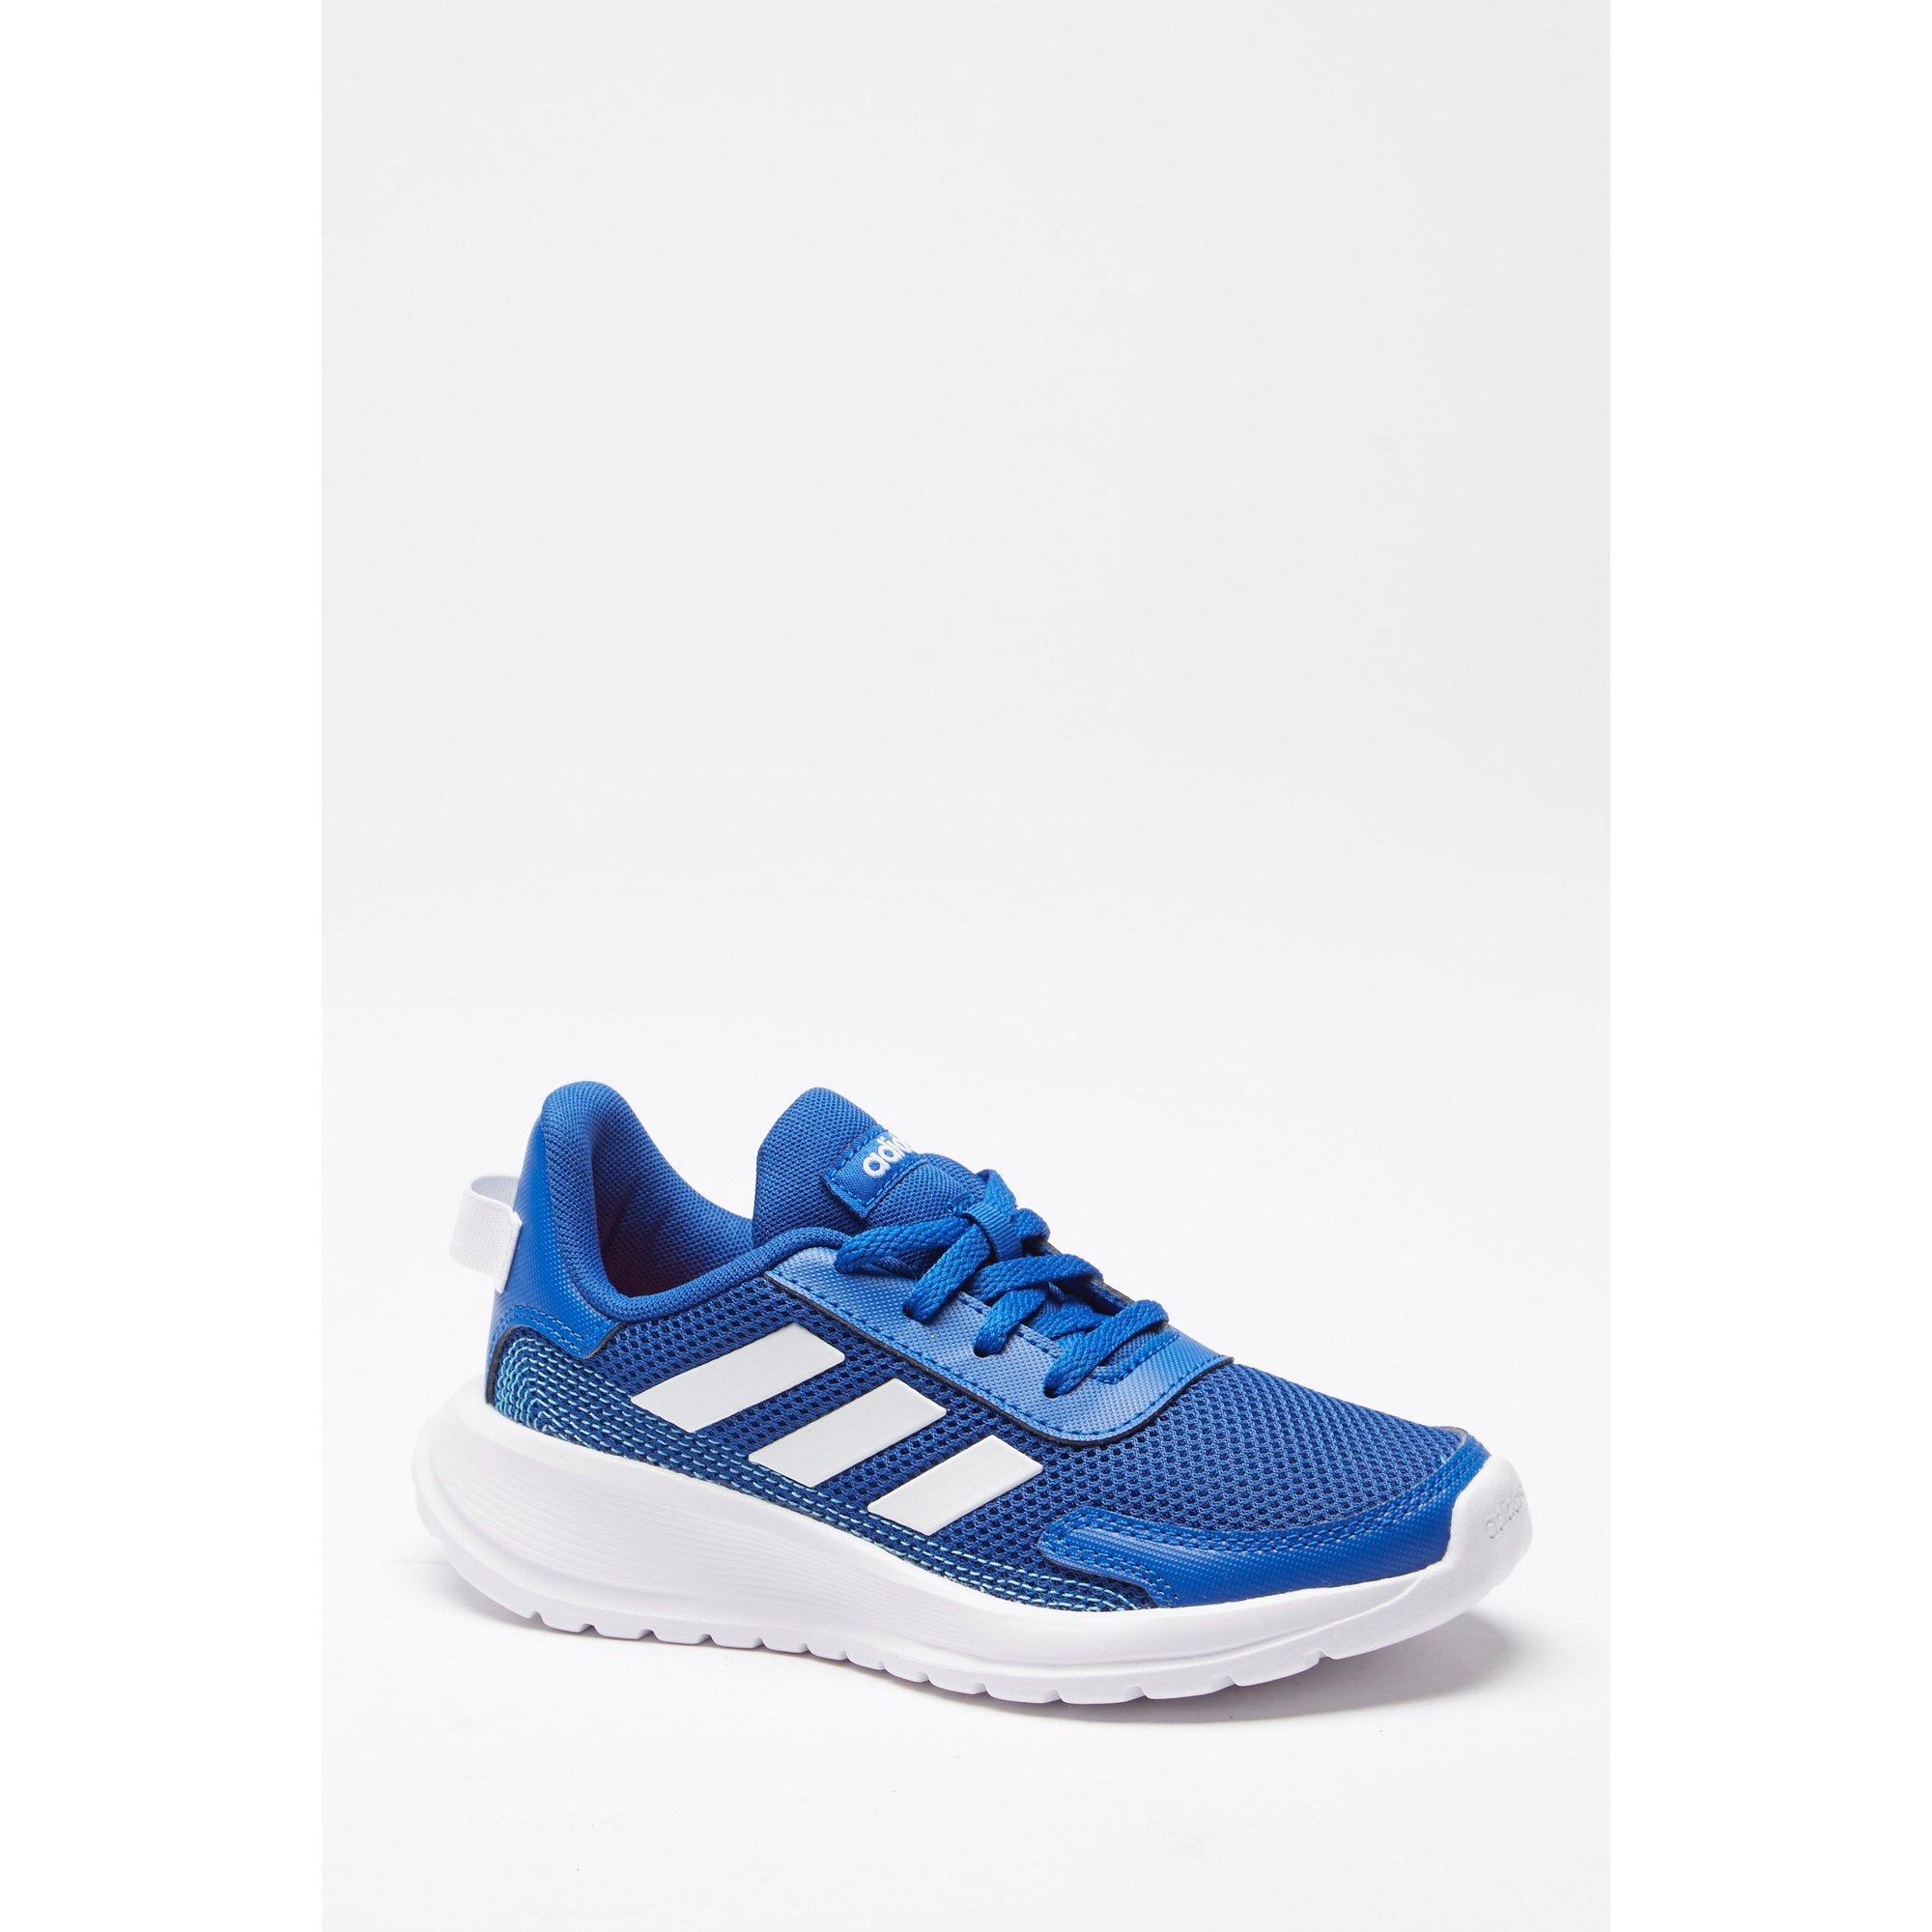 Image of adidas Tensaur Blue Junior Run Trainers